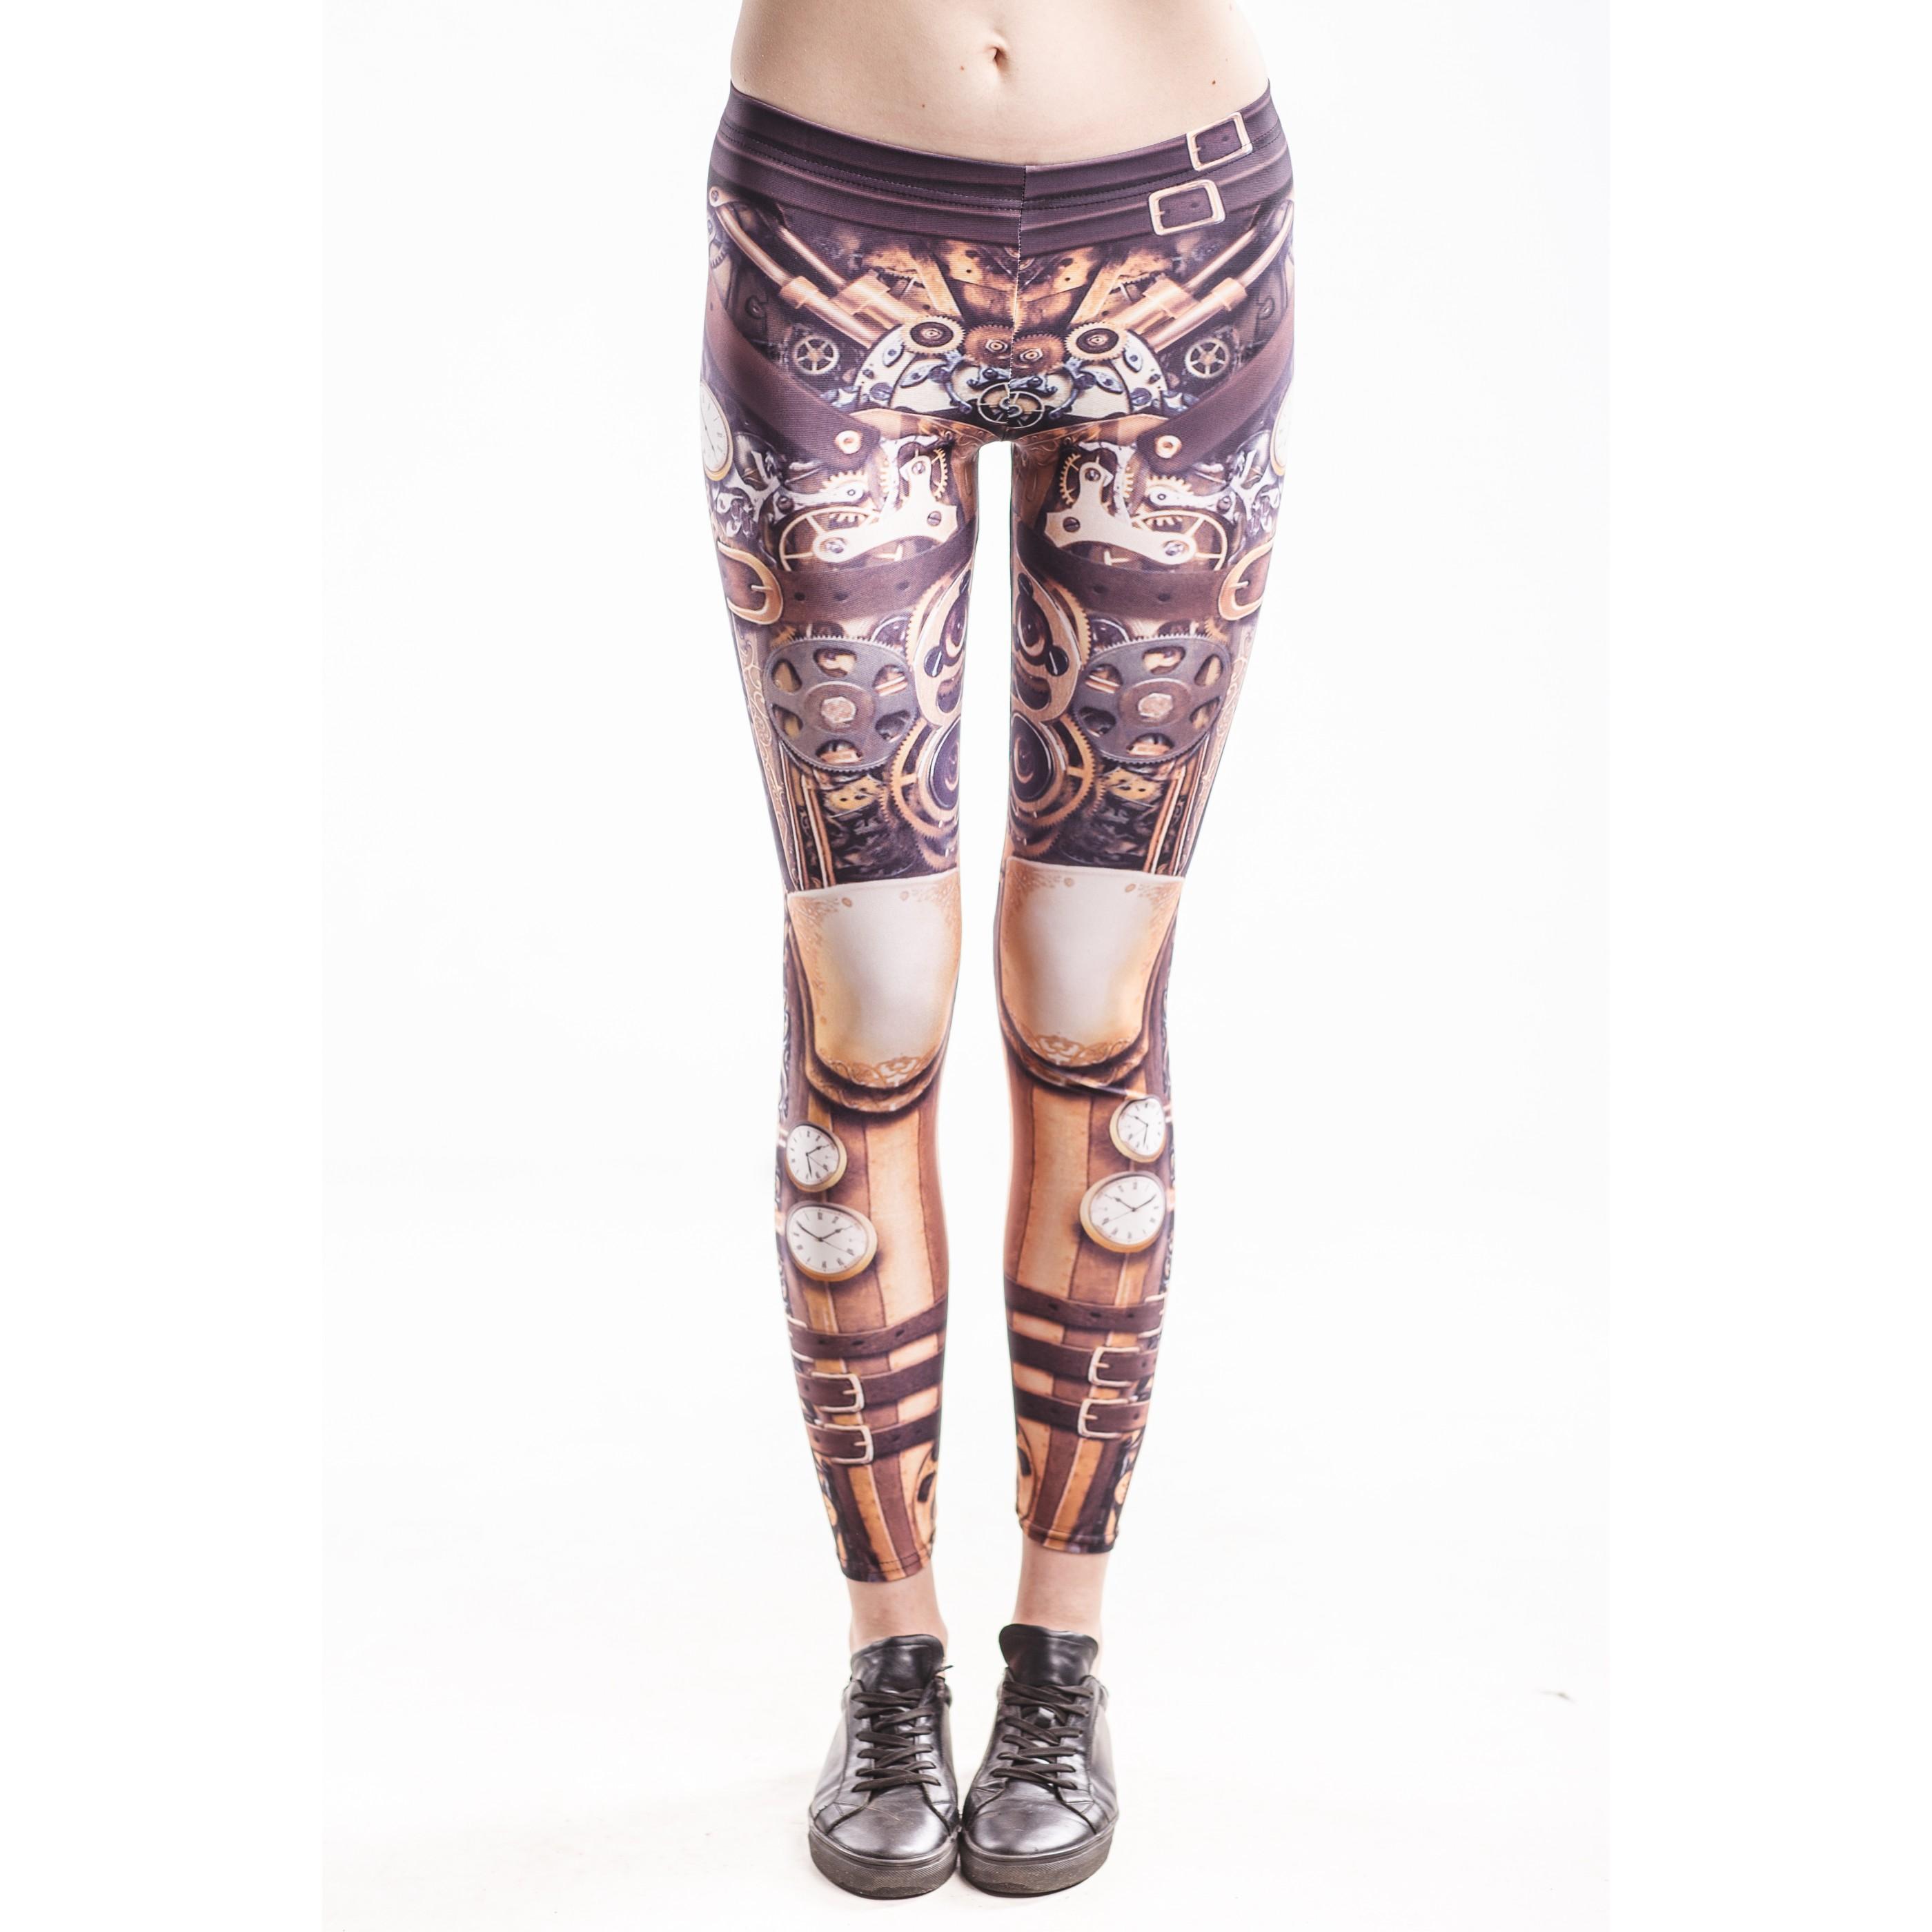 FD SHOP Steampunk leggings